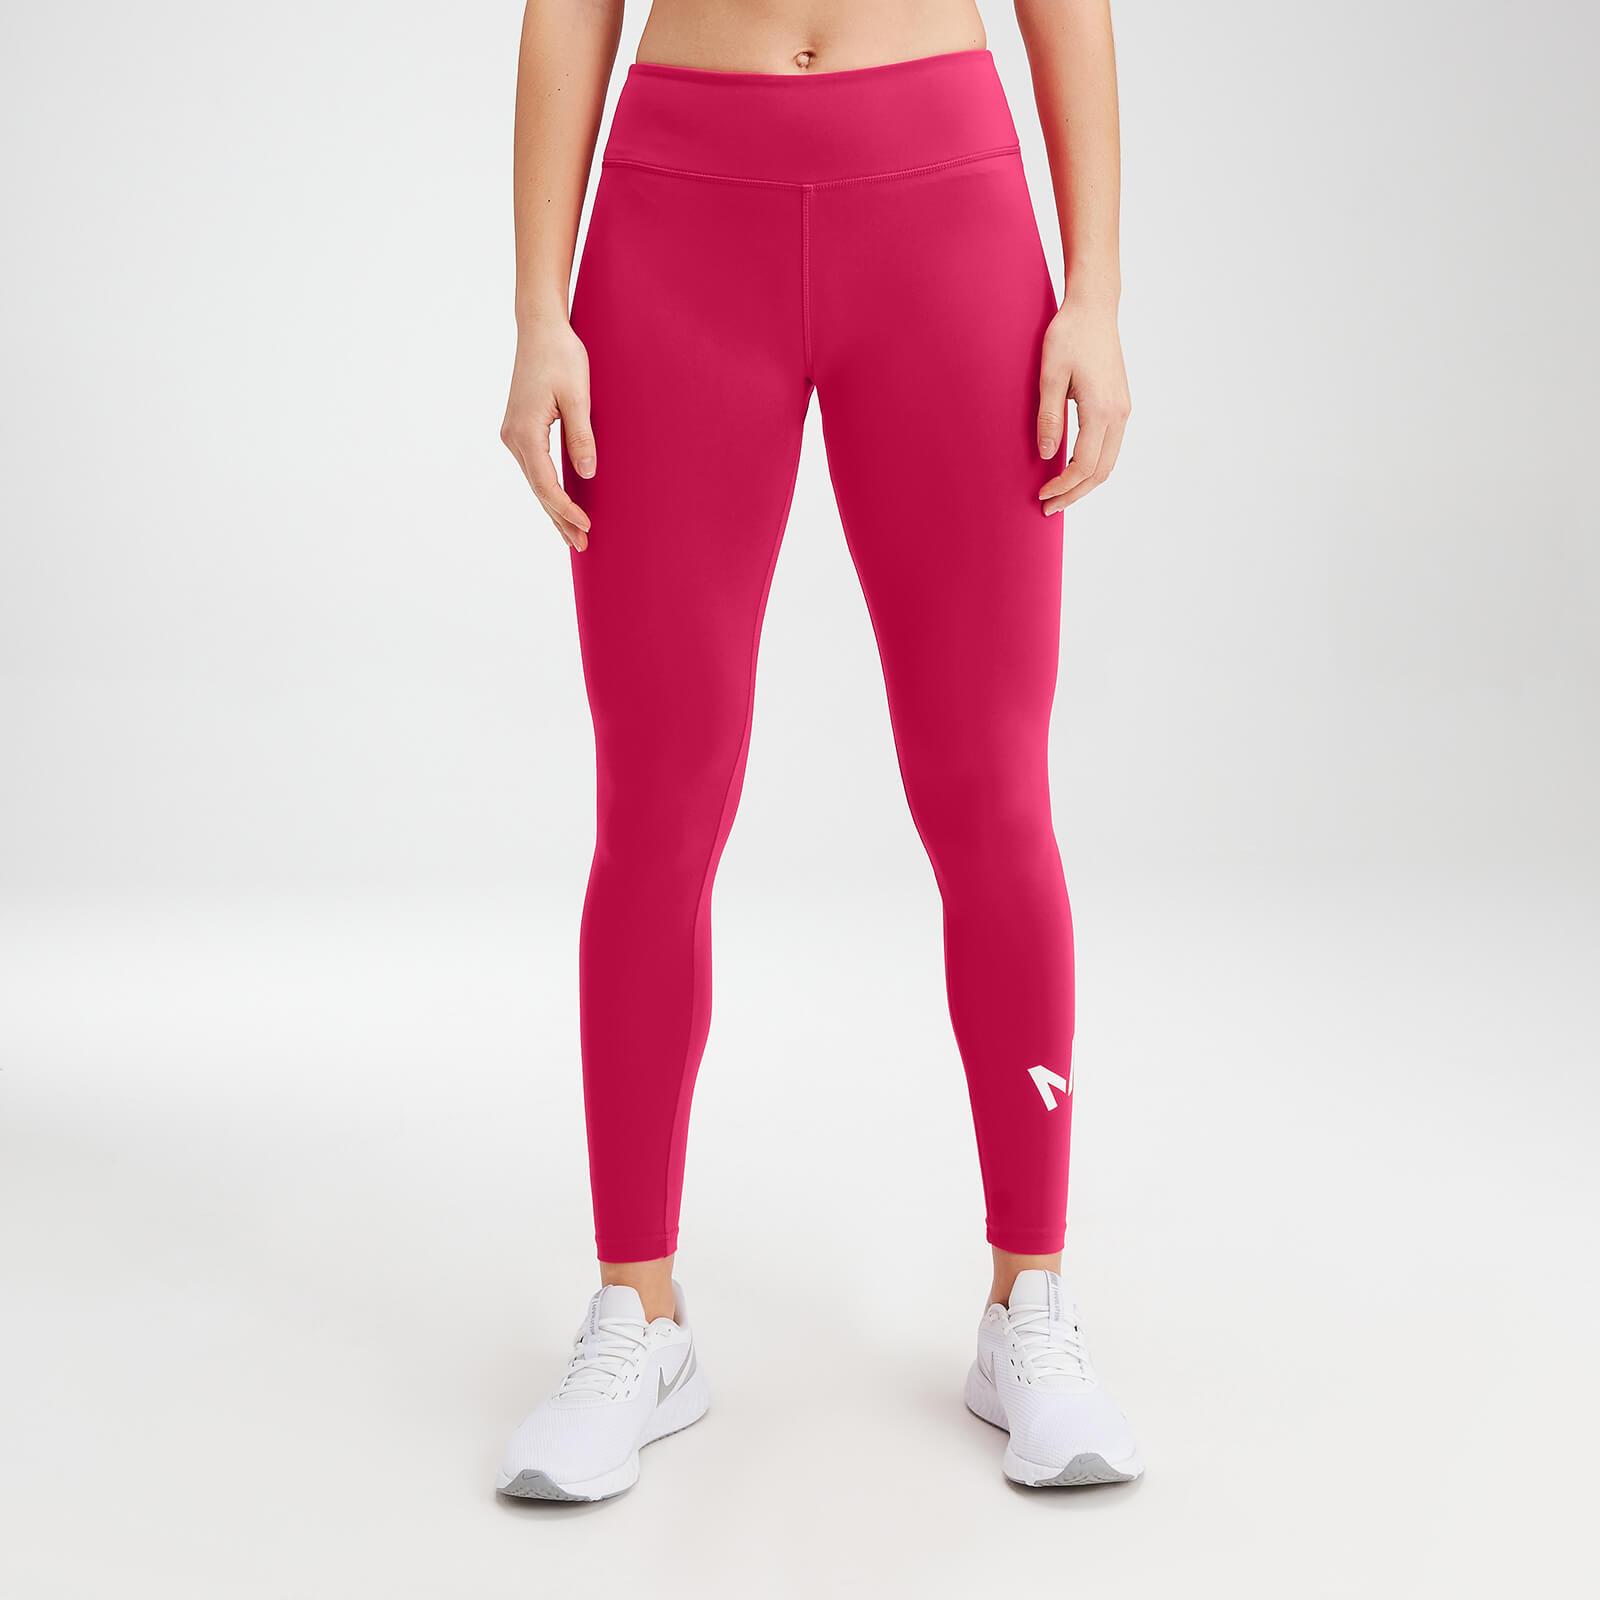 Купить MP Women's Essentials Training Leggings - Virtual Pink - XXL, Myprotein International